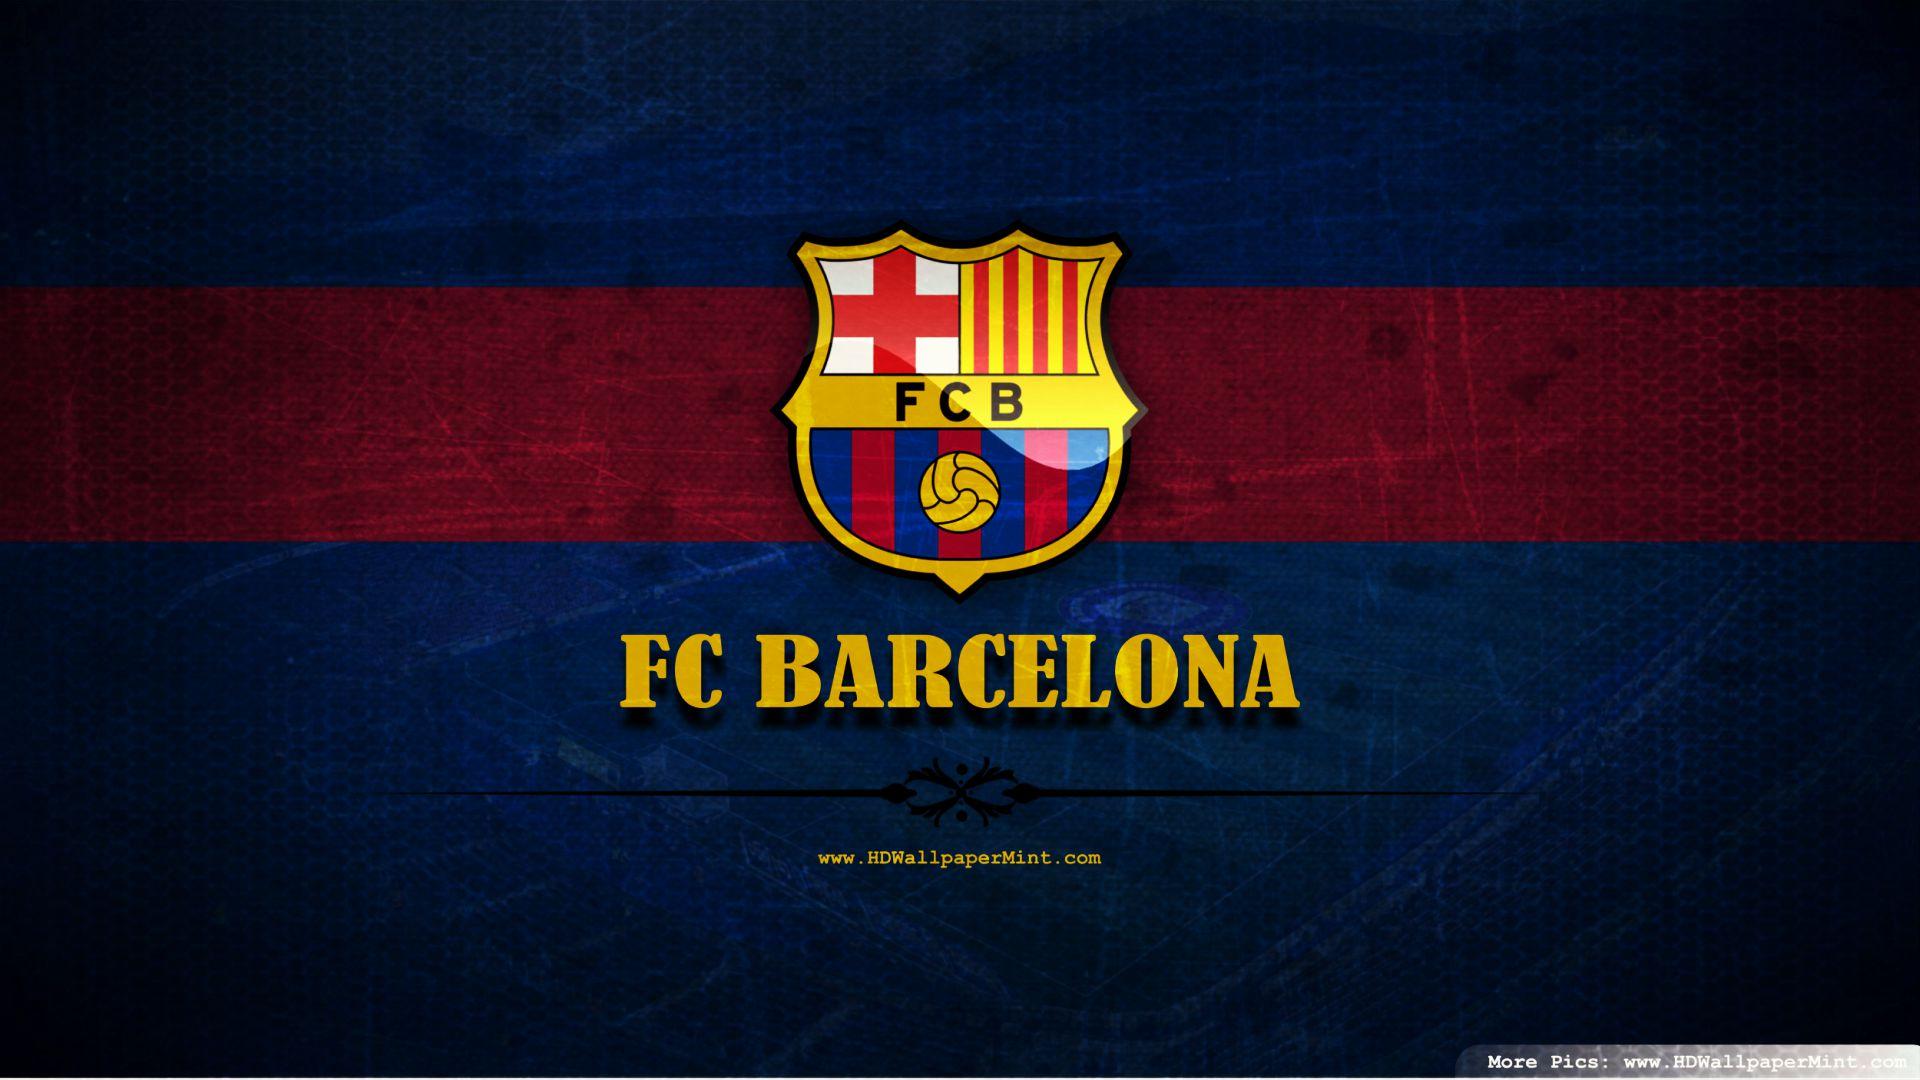 fc barcelona wallpapers HD 1920x1080